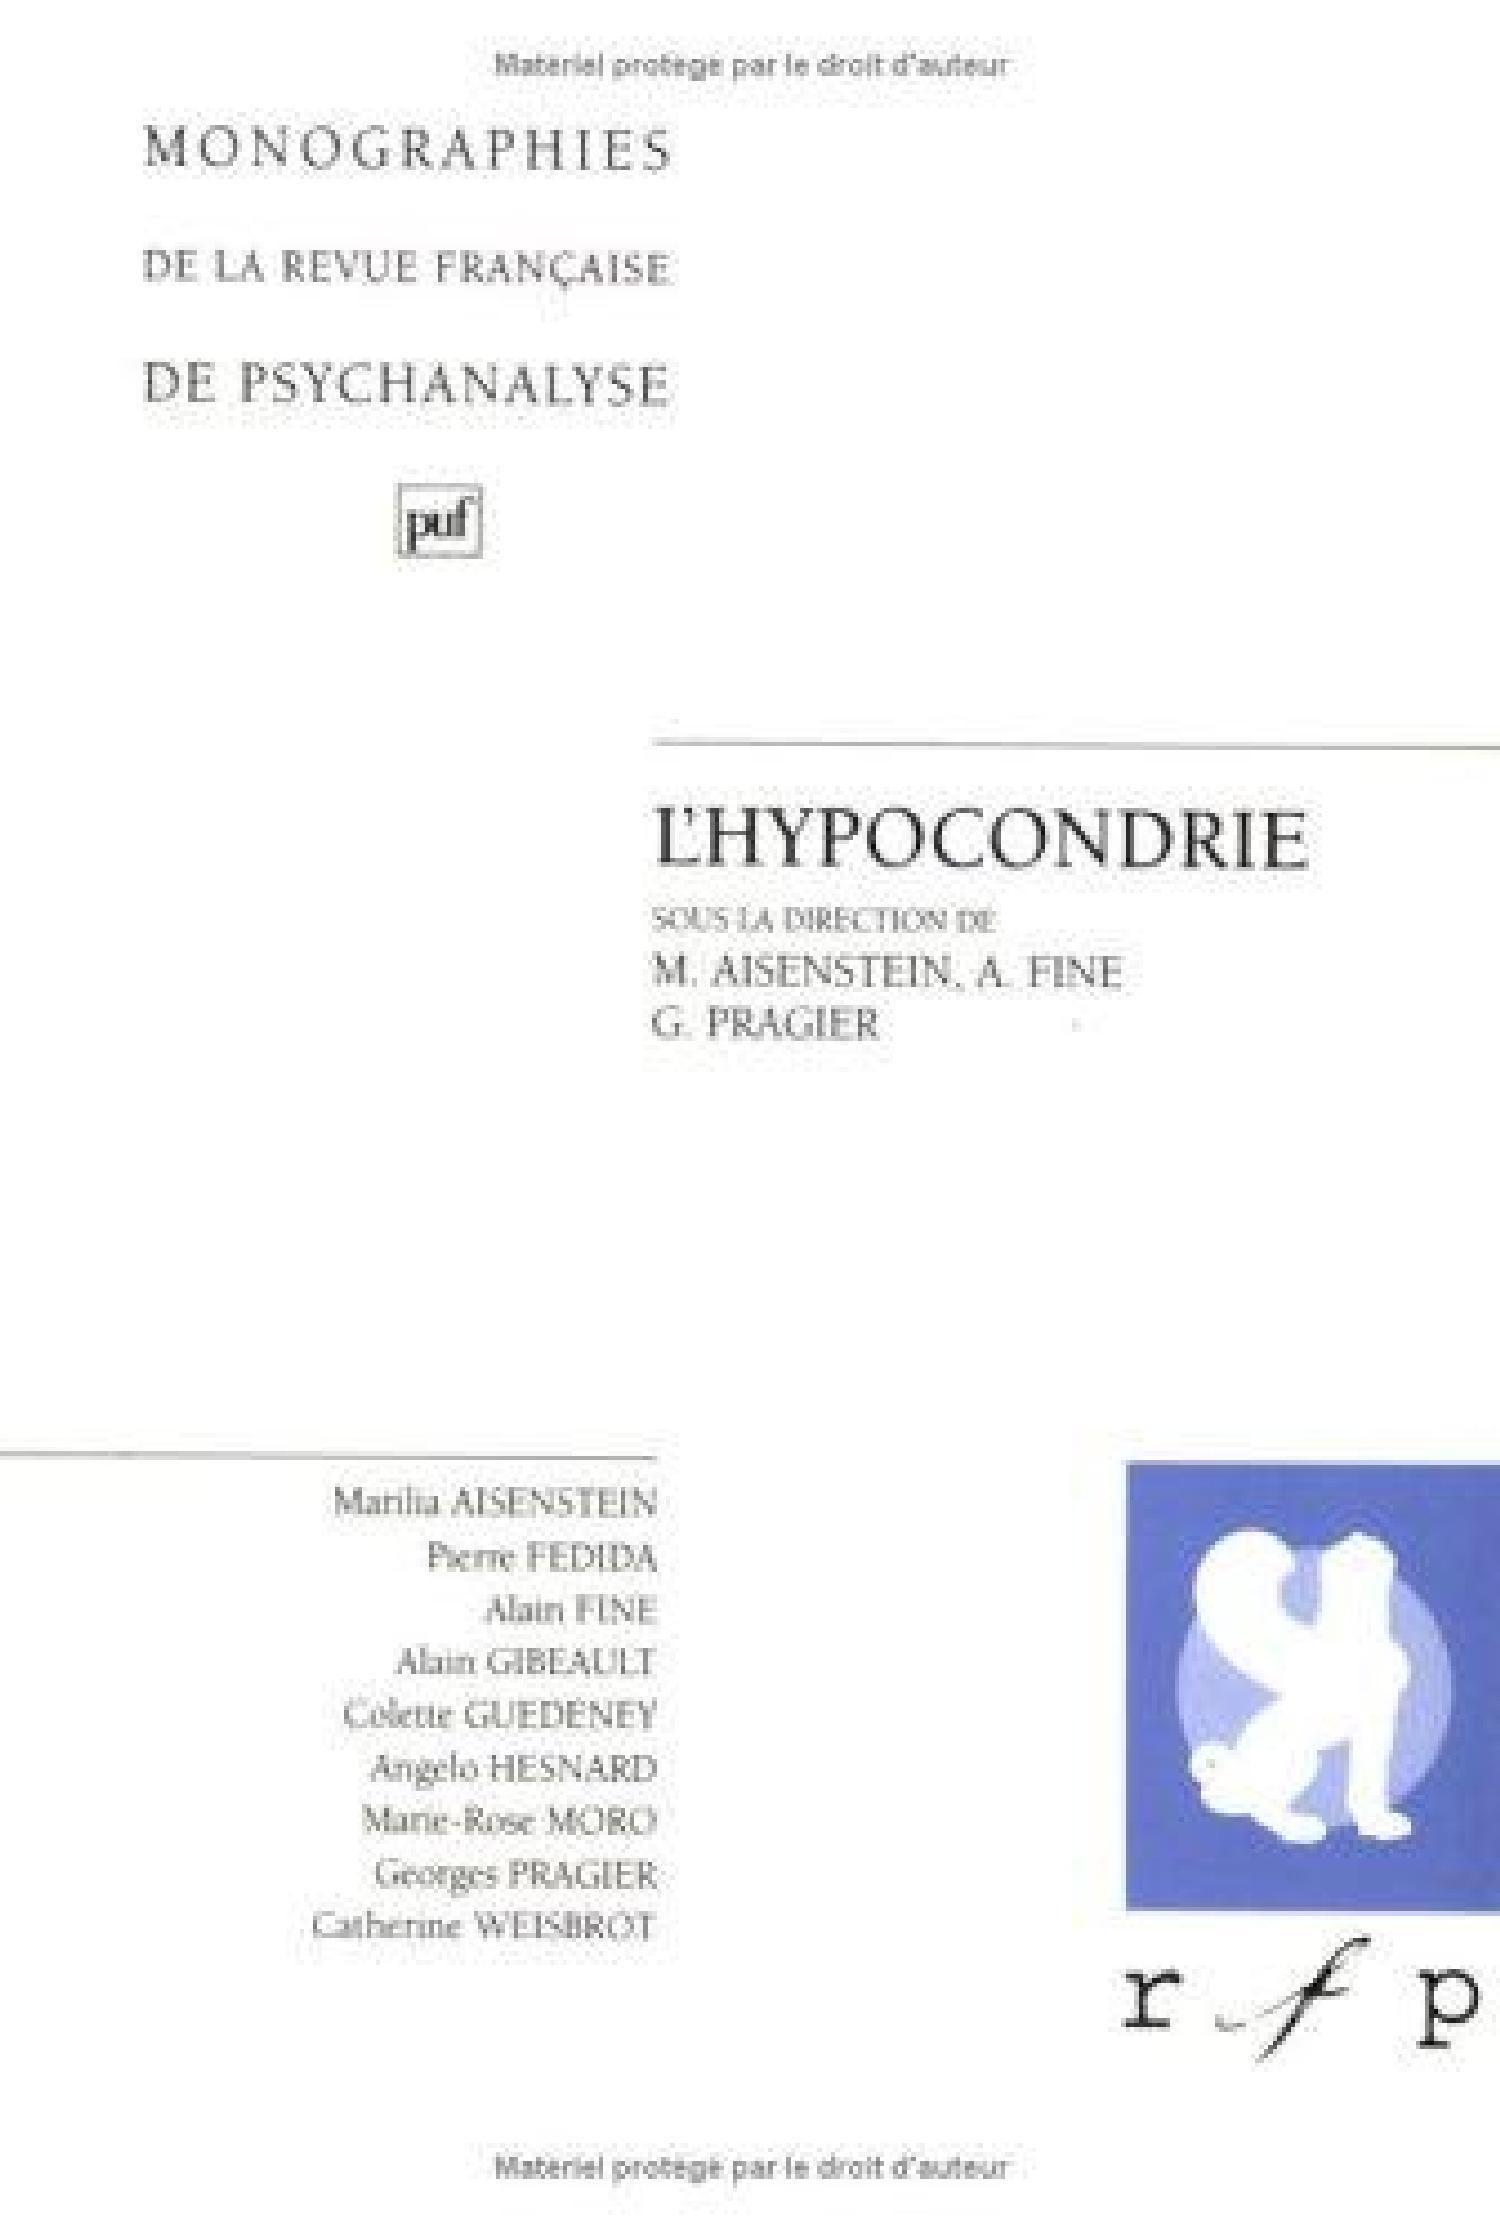 L'histoire de l'hypocondrie | Cairn.info